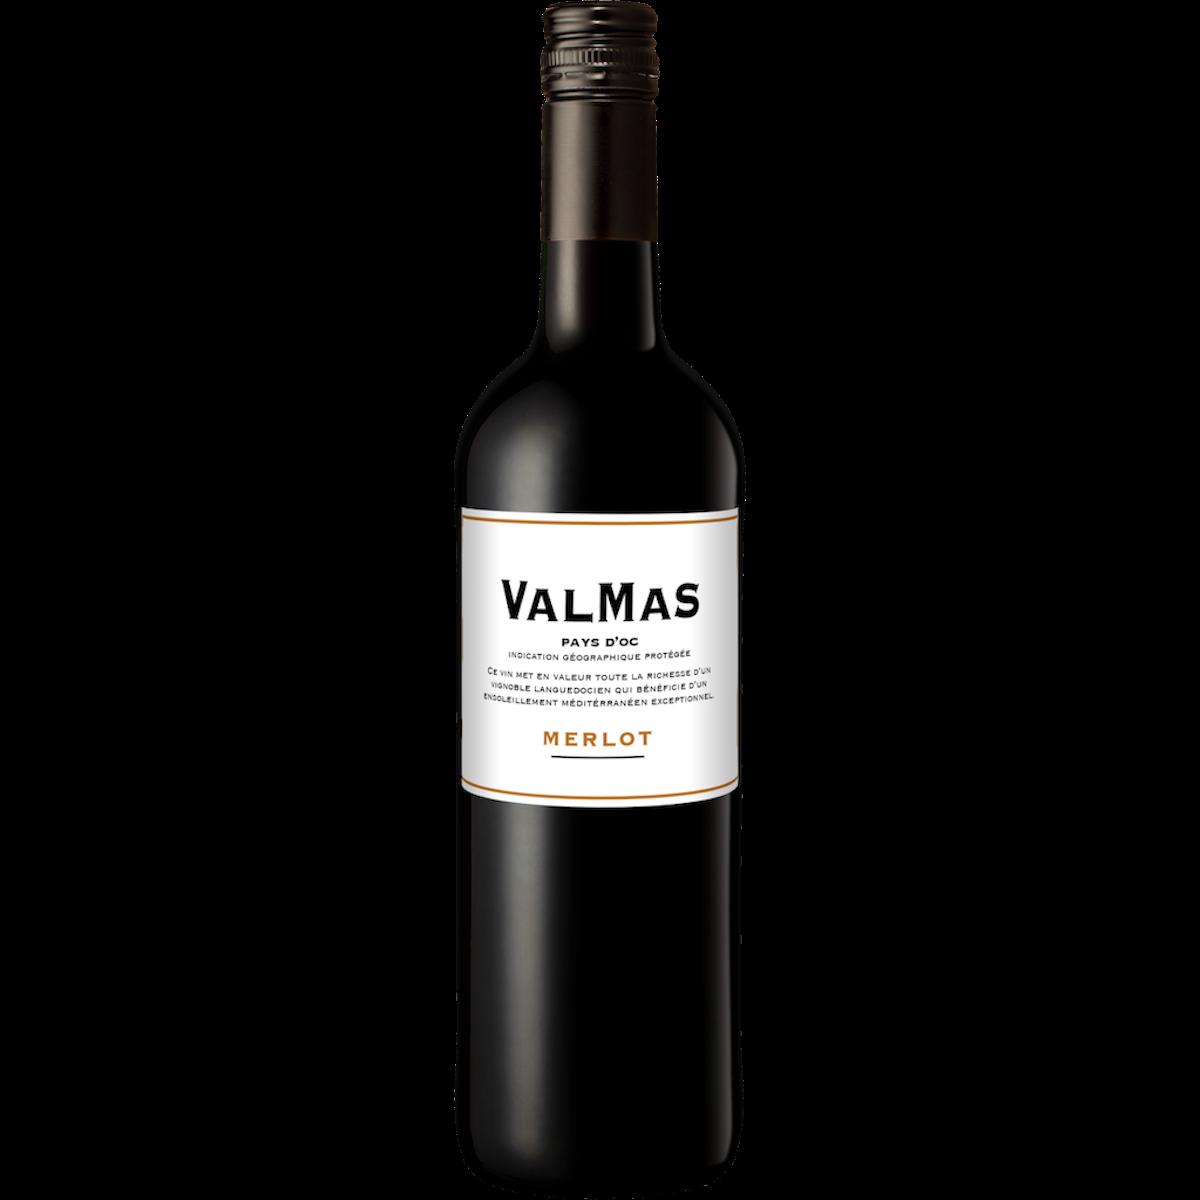 Merlot 'Valmas', 2019